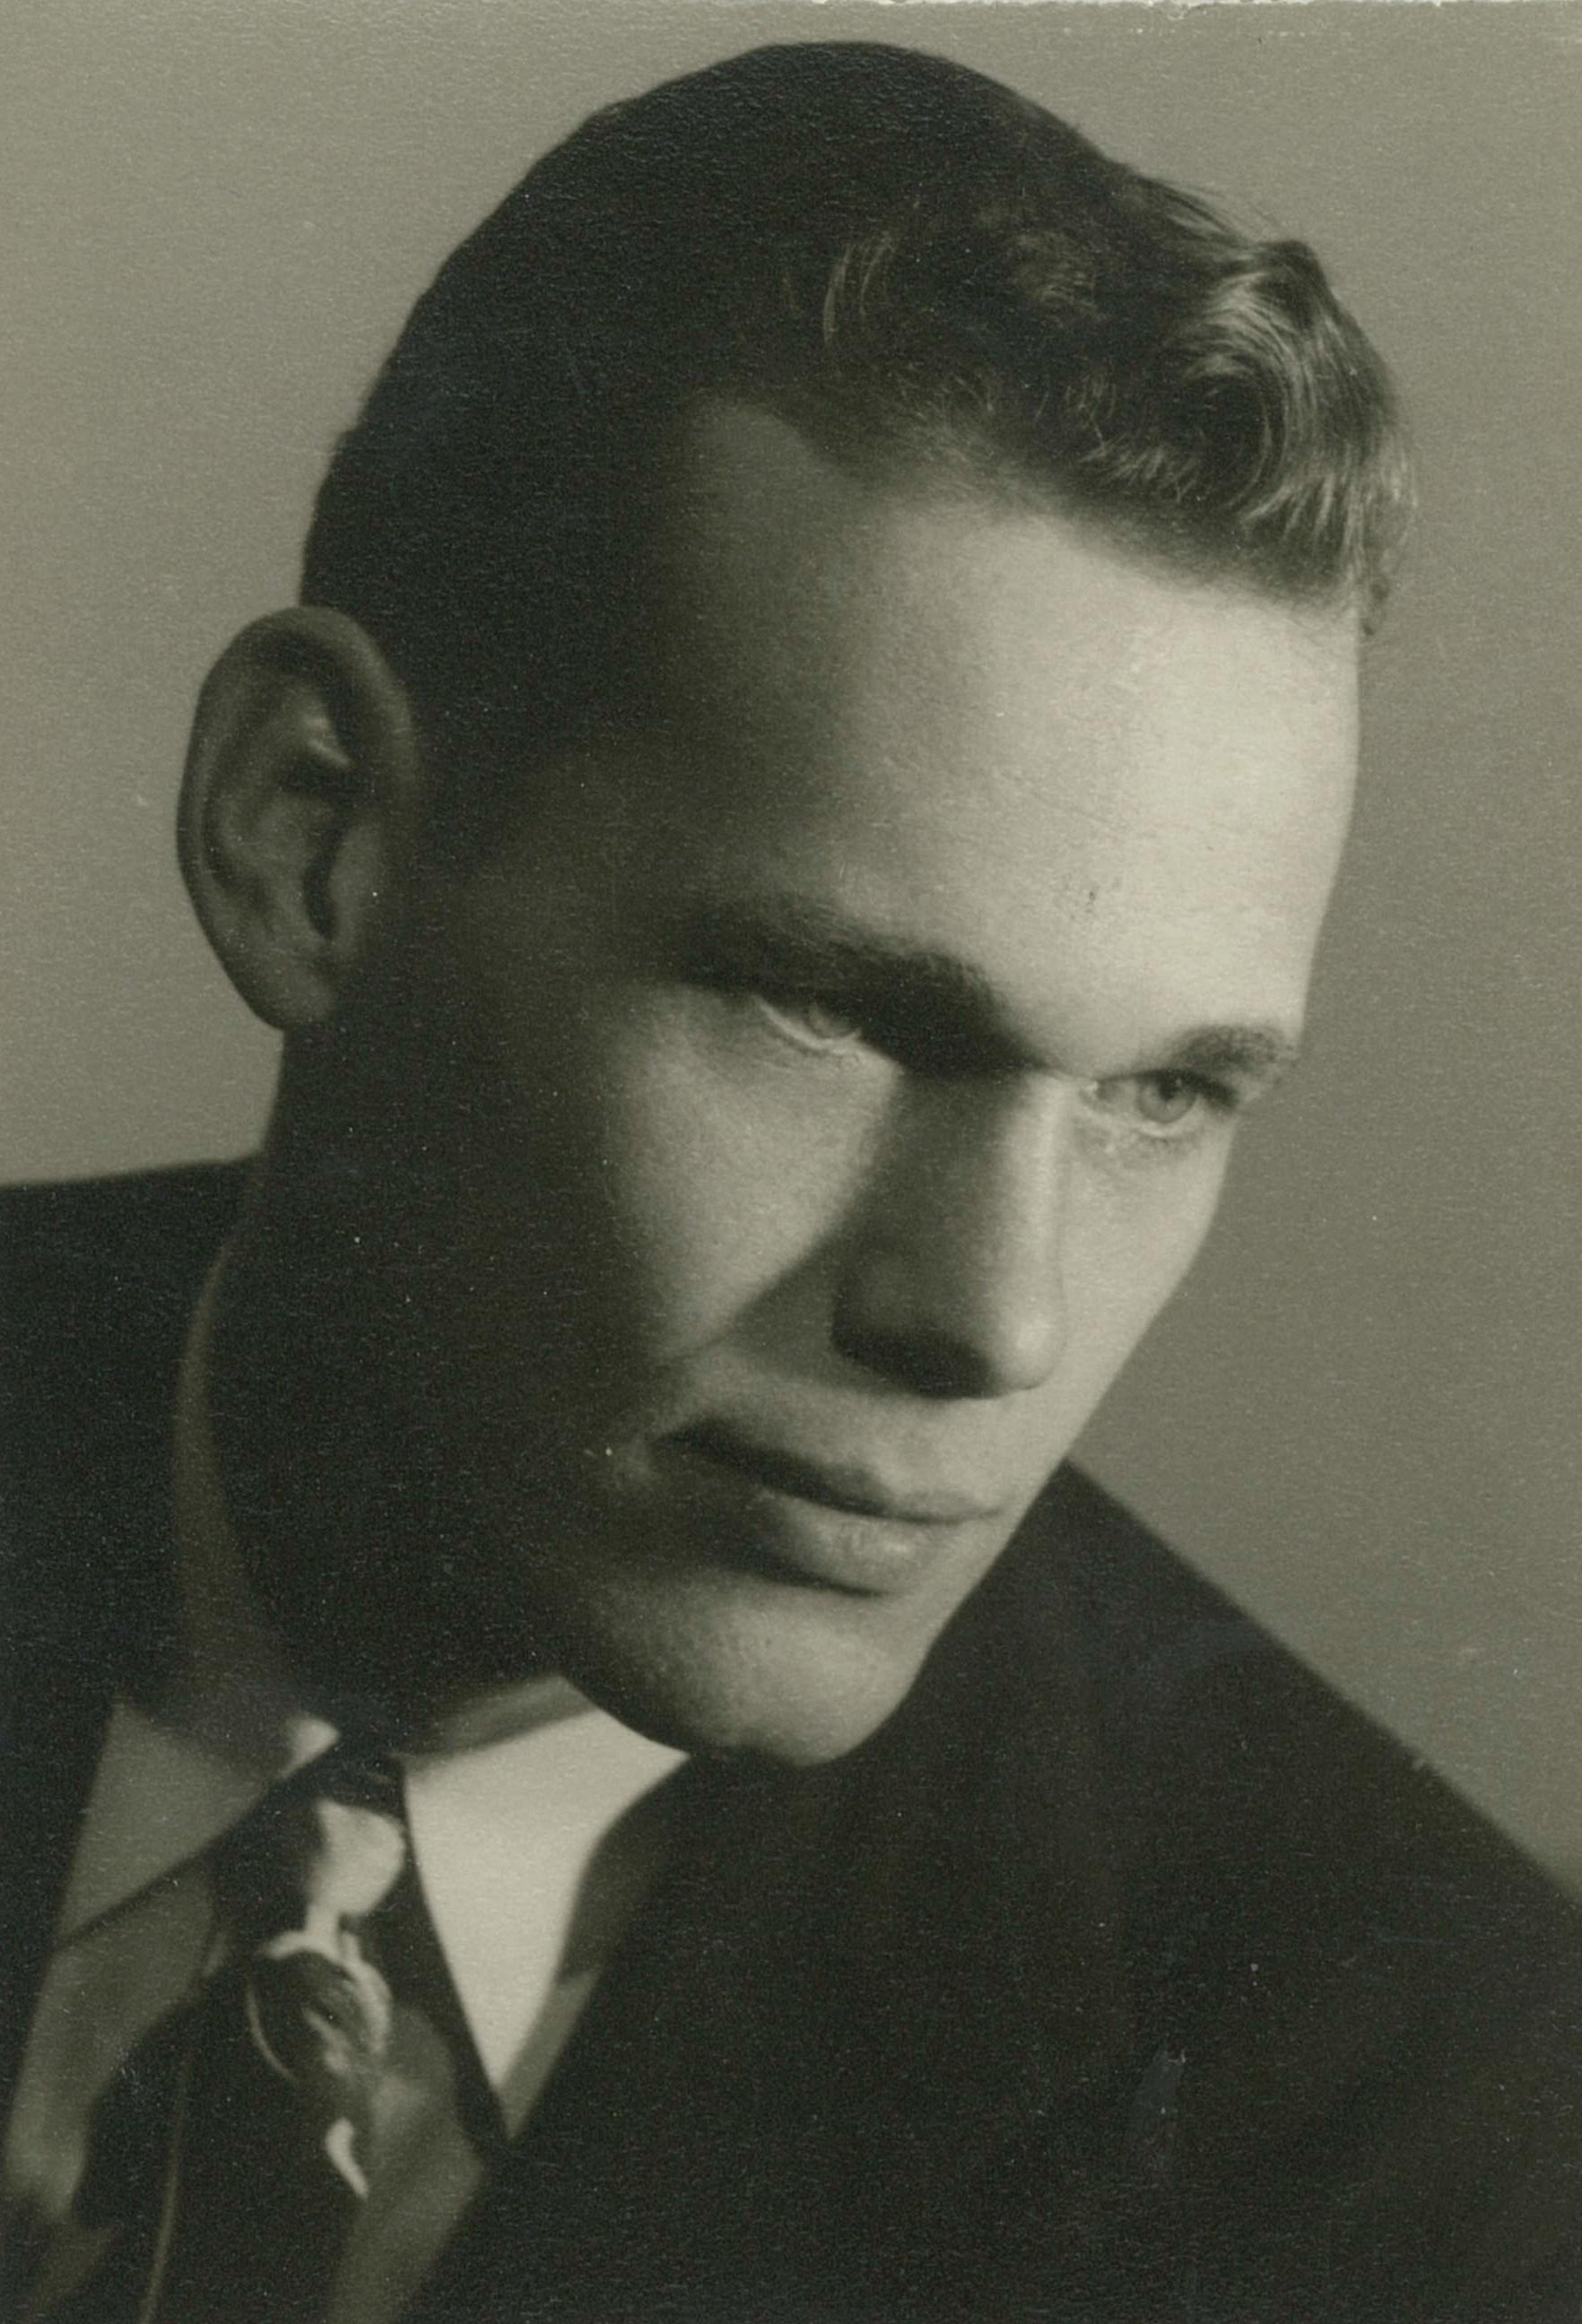 Carl Edmund Ludlow